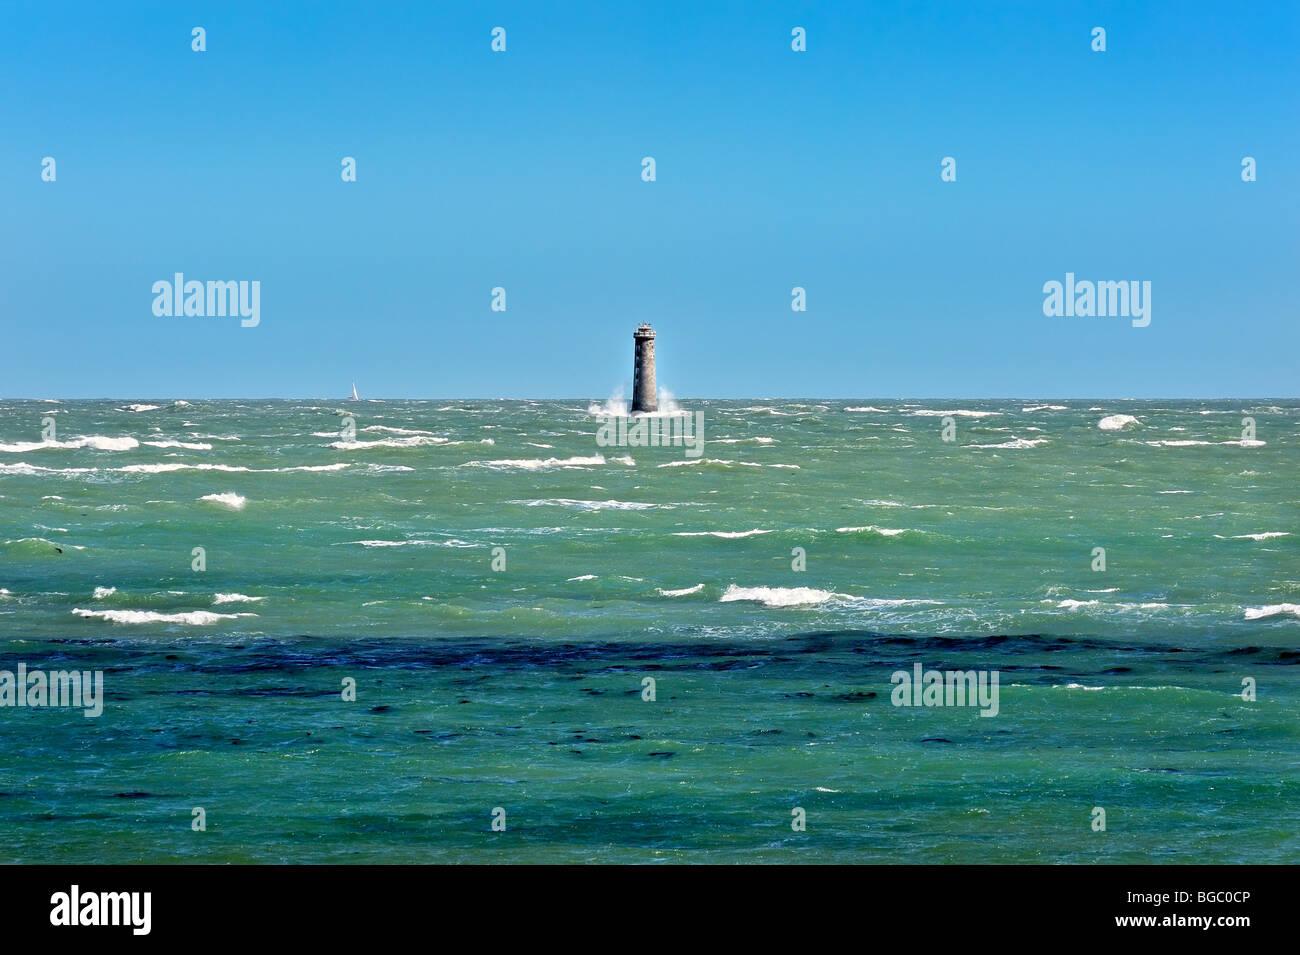 The Atlantic ocean at Ile de Re, France. - Stock Image